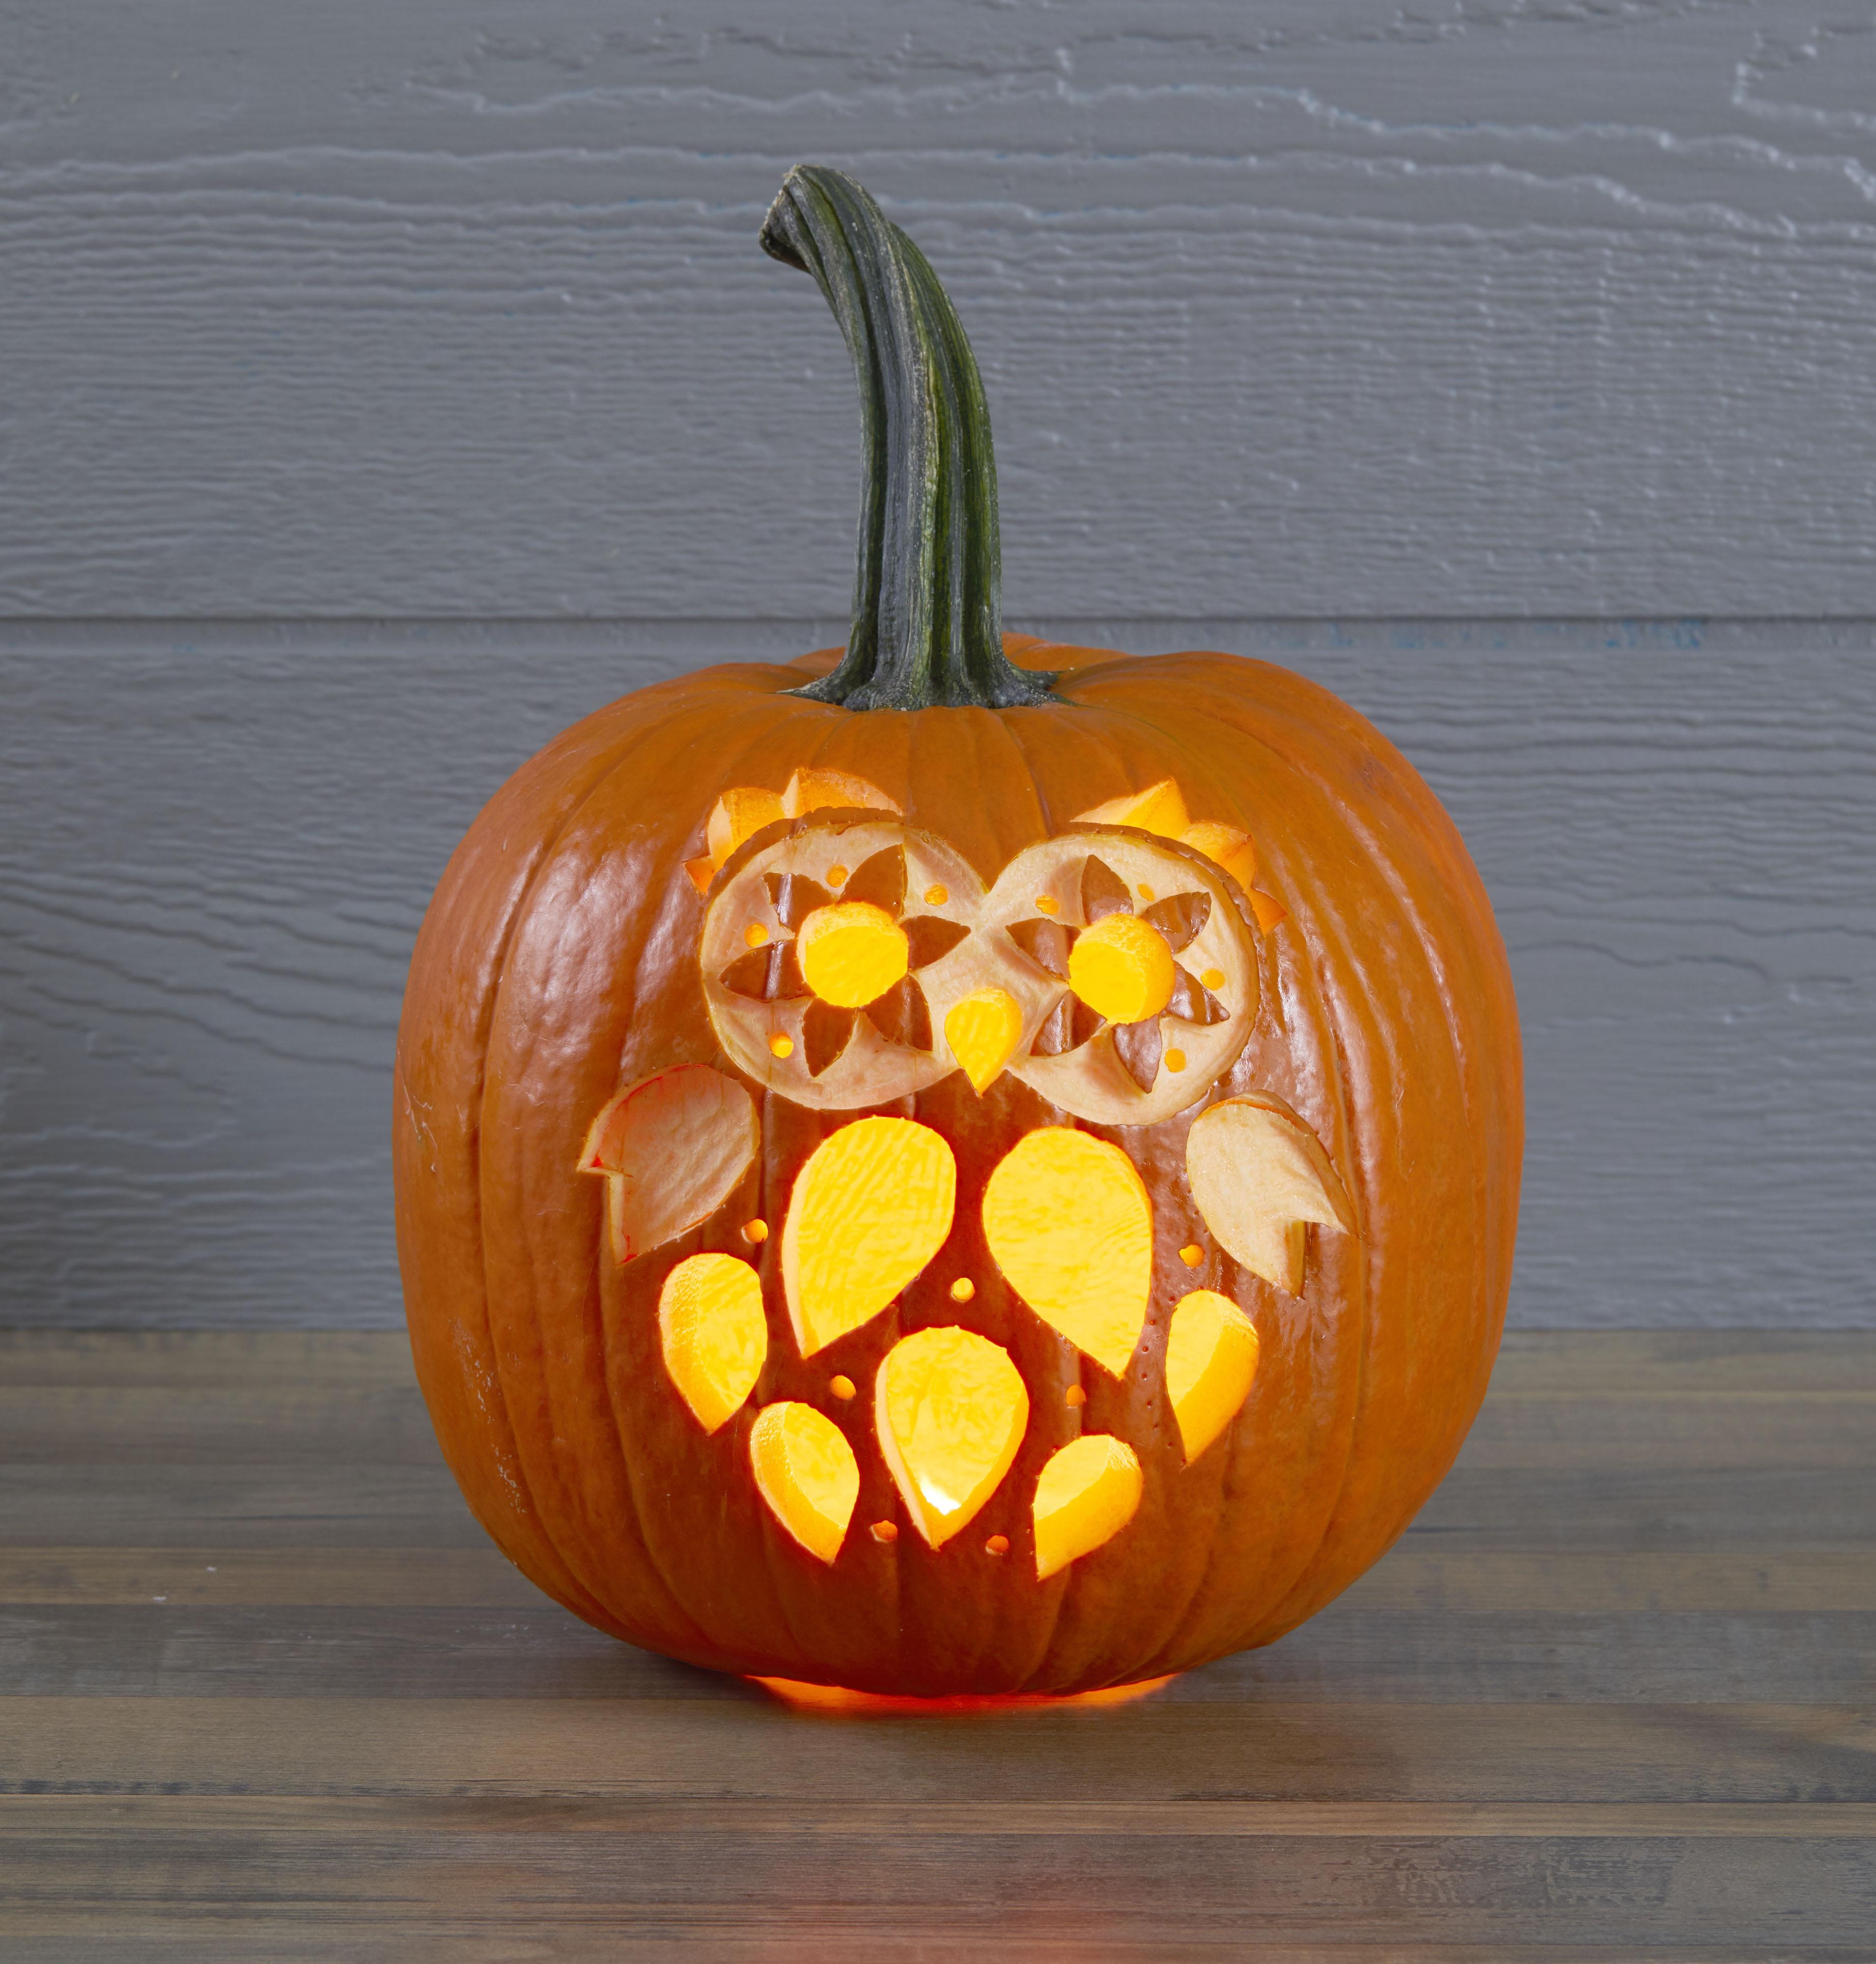 Printable Pumpkin Stencils | Better Homes & Gardens - Free Online Pumpkin Carving Patterns Printable